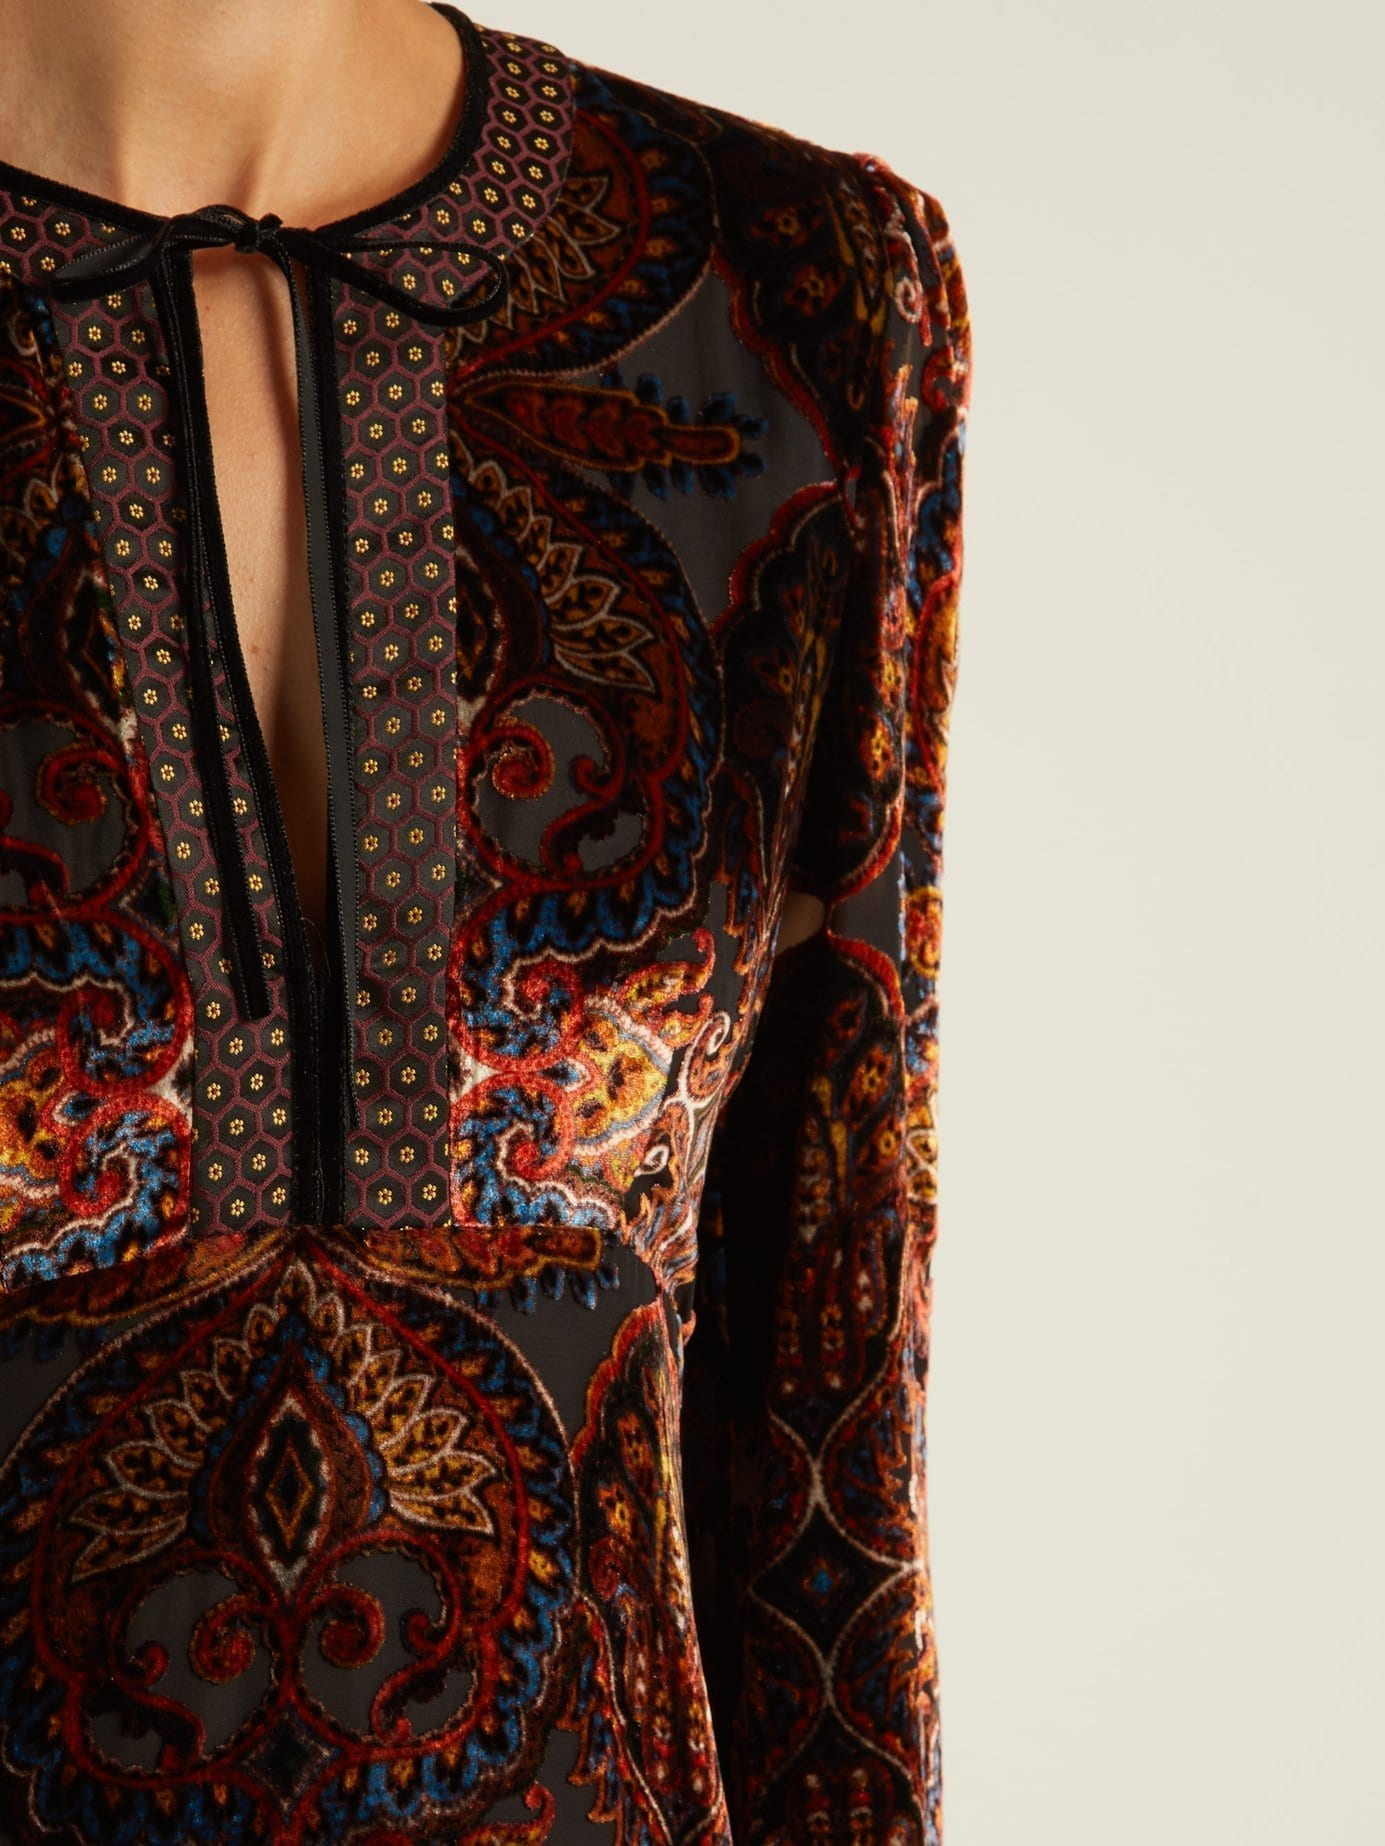 8669e79d7d0 ETRO Rosolite Paisley Devoré Velvet Orange Dress - We Select Dresses